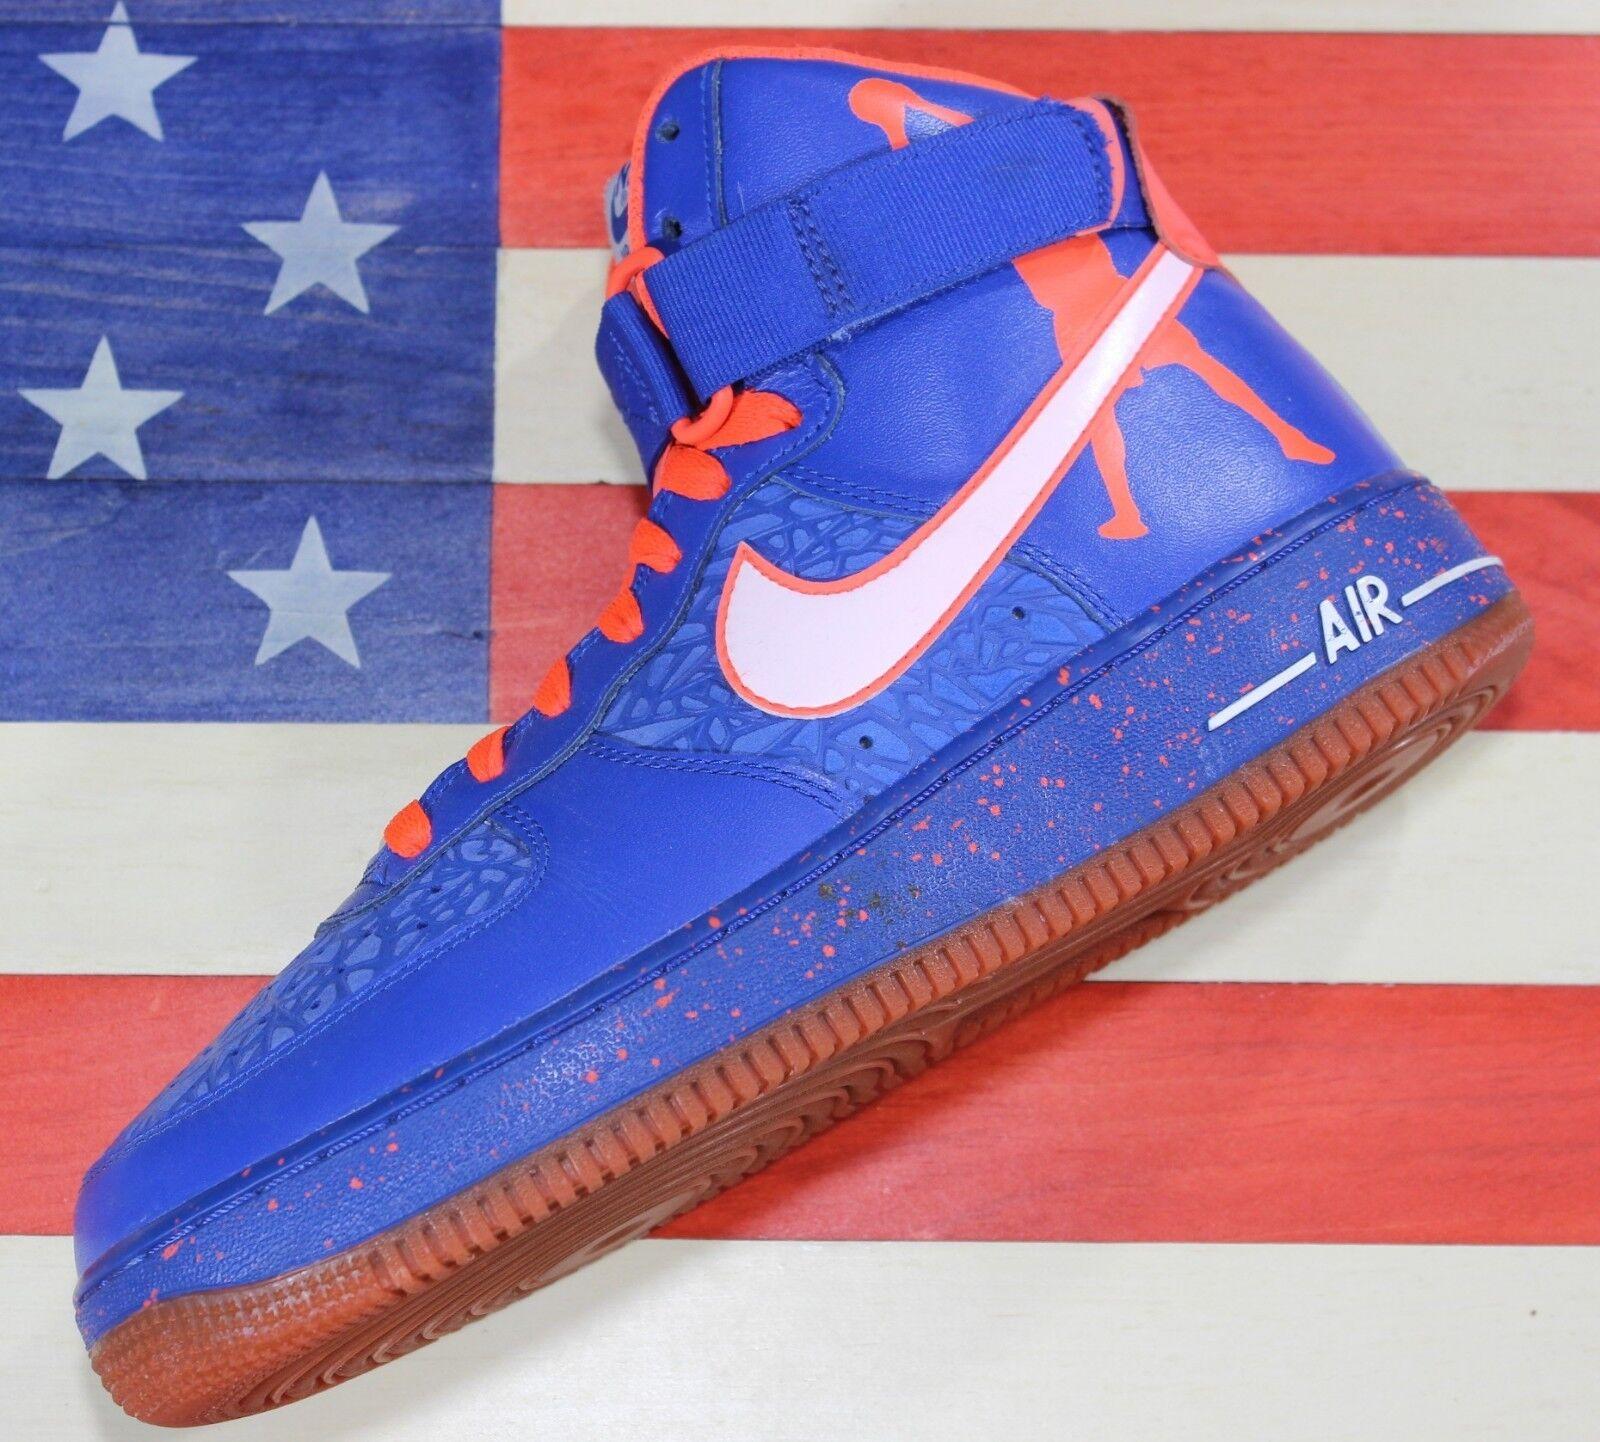 Nike air force 1 hi rasheed wallace scarpa blu arancione basket scarpa wallace (624185-400] 8 c7e0e4